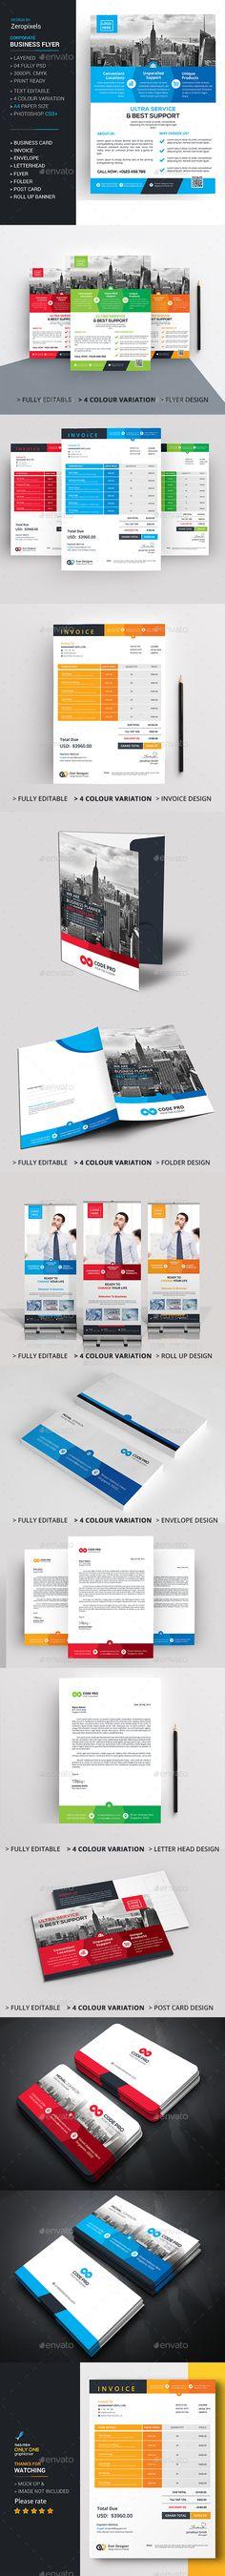 Corporate Branding Stationery Bundle